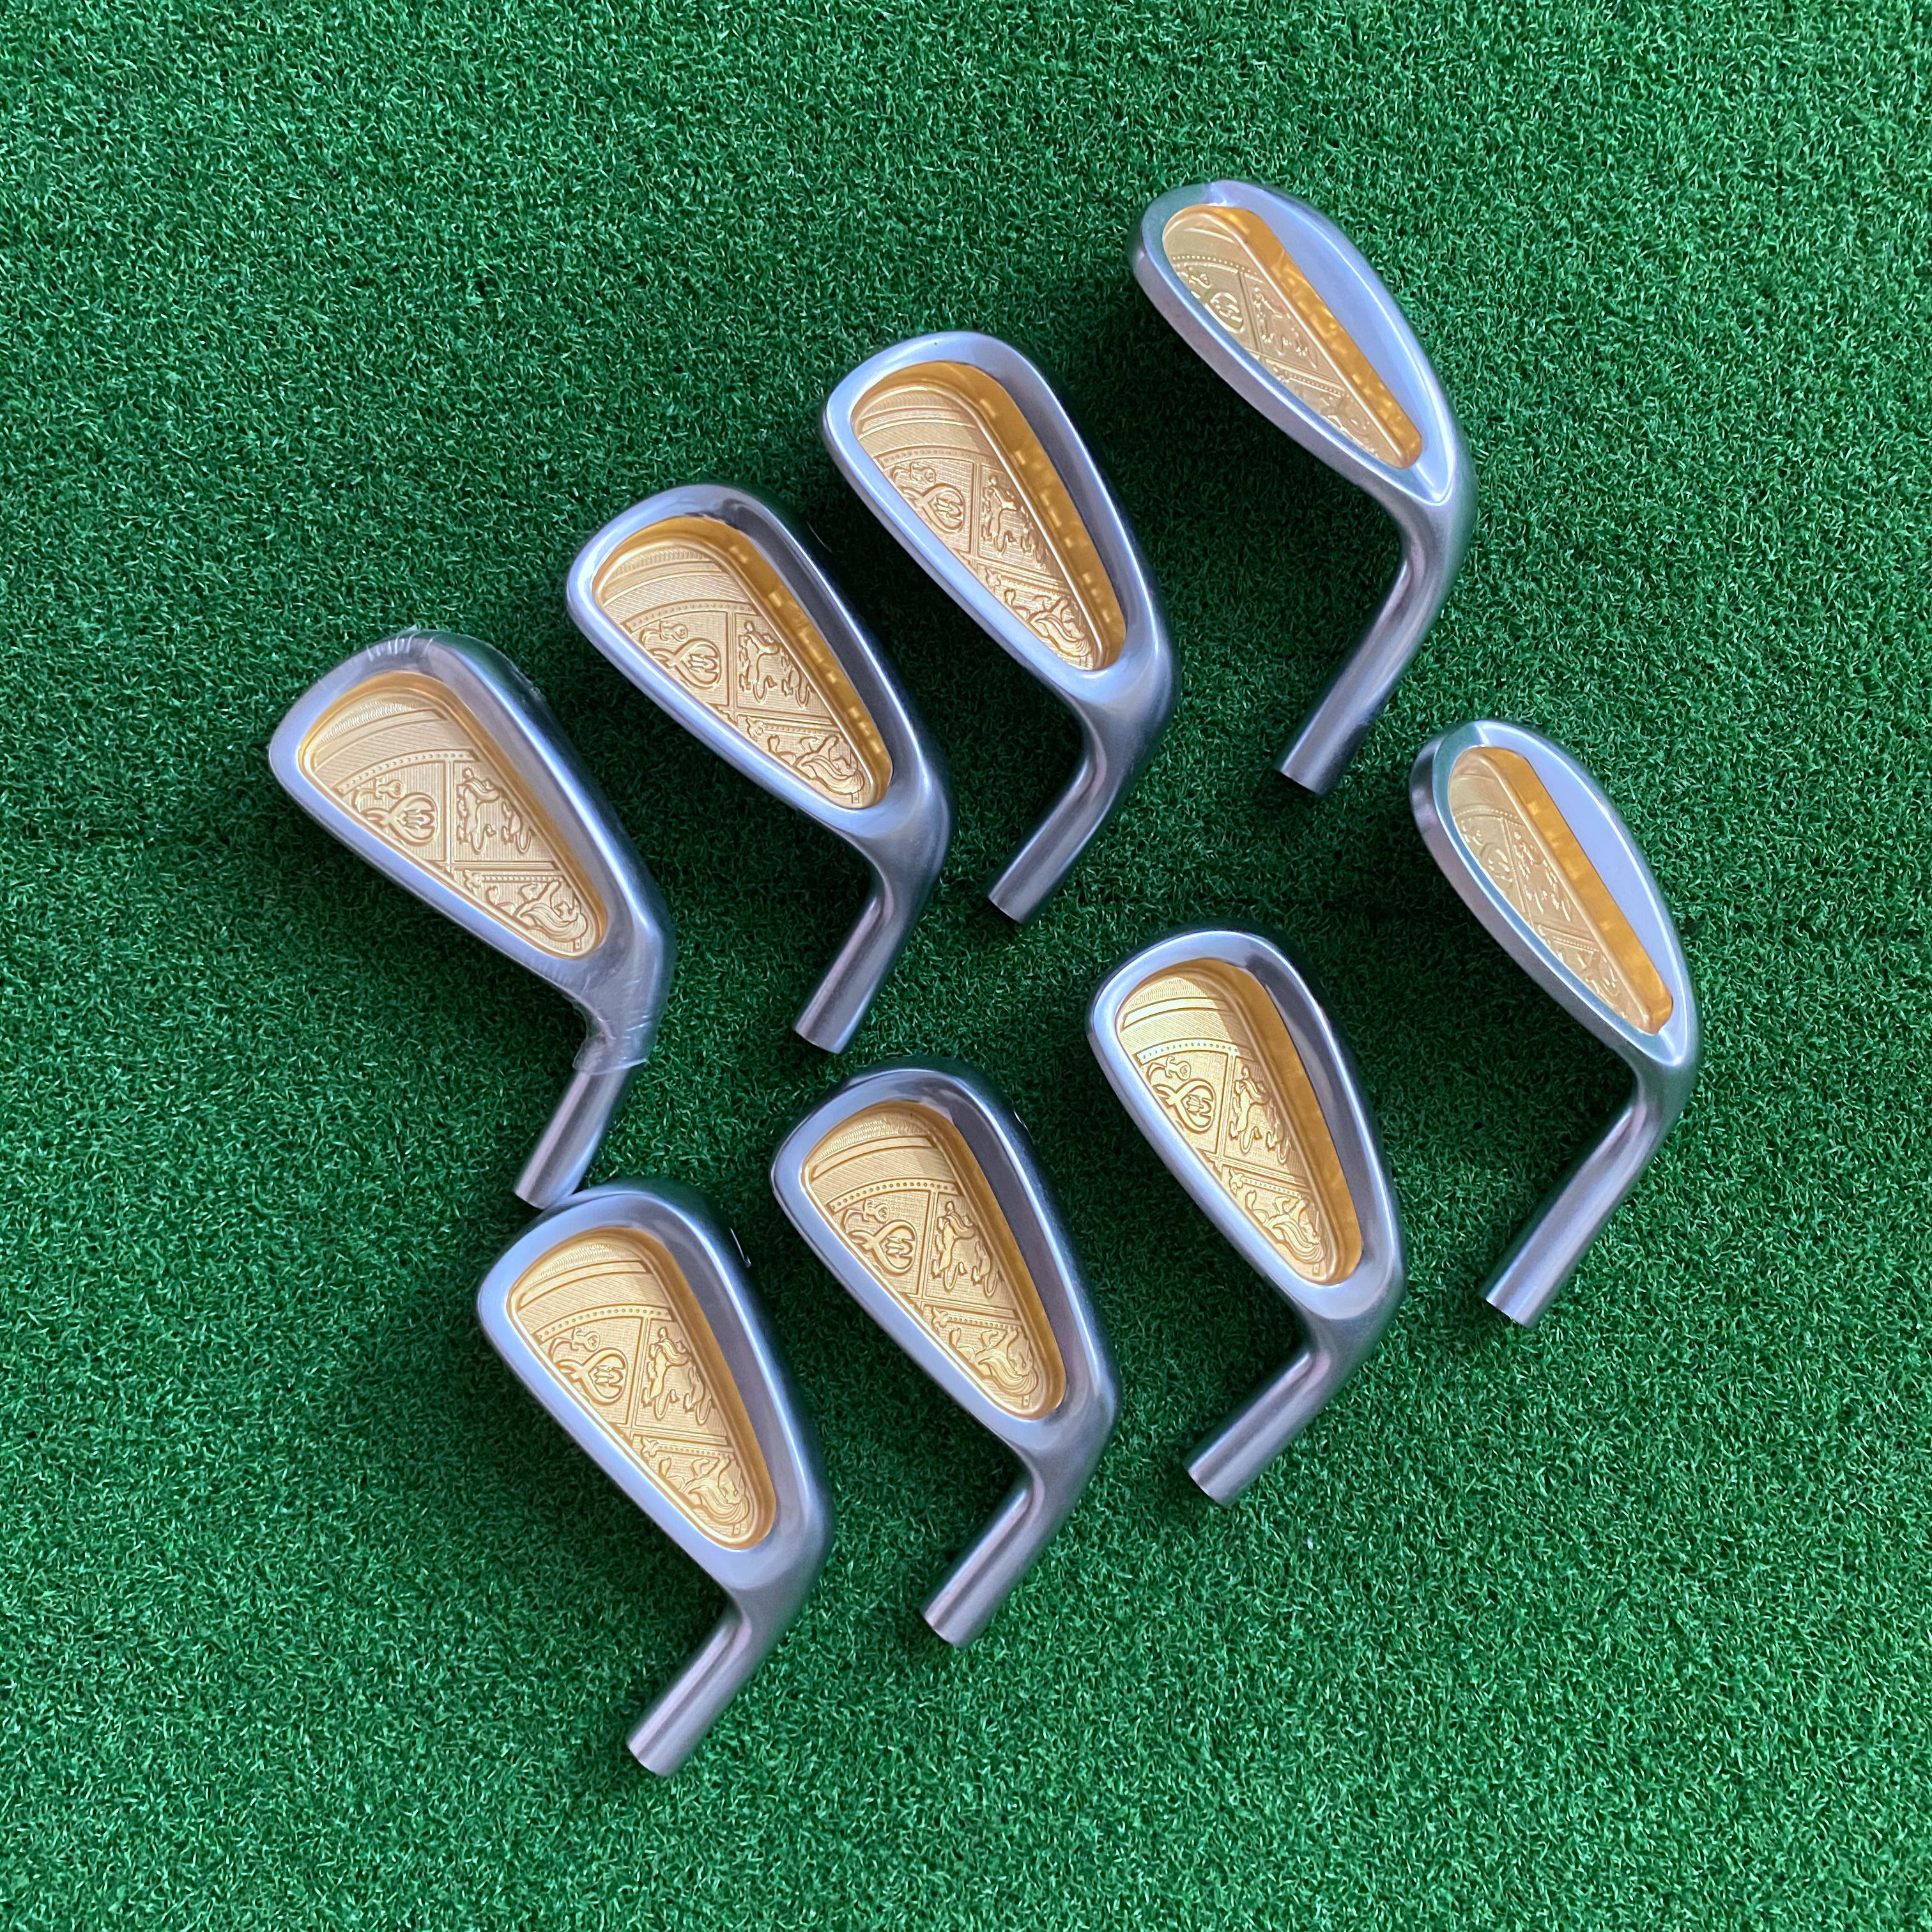 Golf Clubs Irons Head Only 5-s 8 Pcs No Shaft Free Shipping Soft Iron Teardrop Men